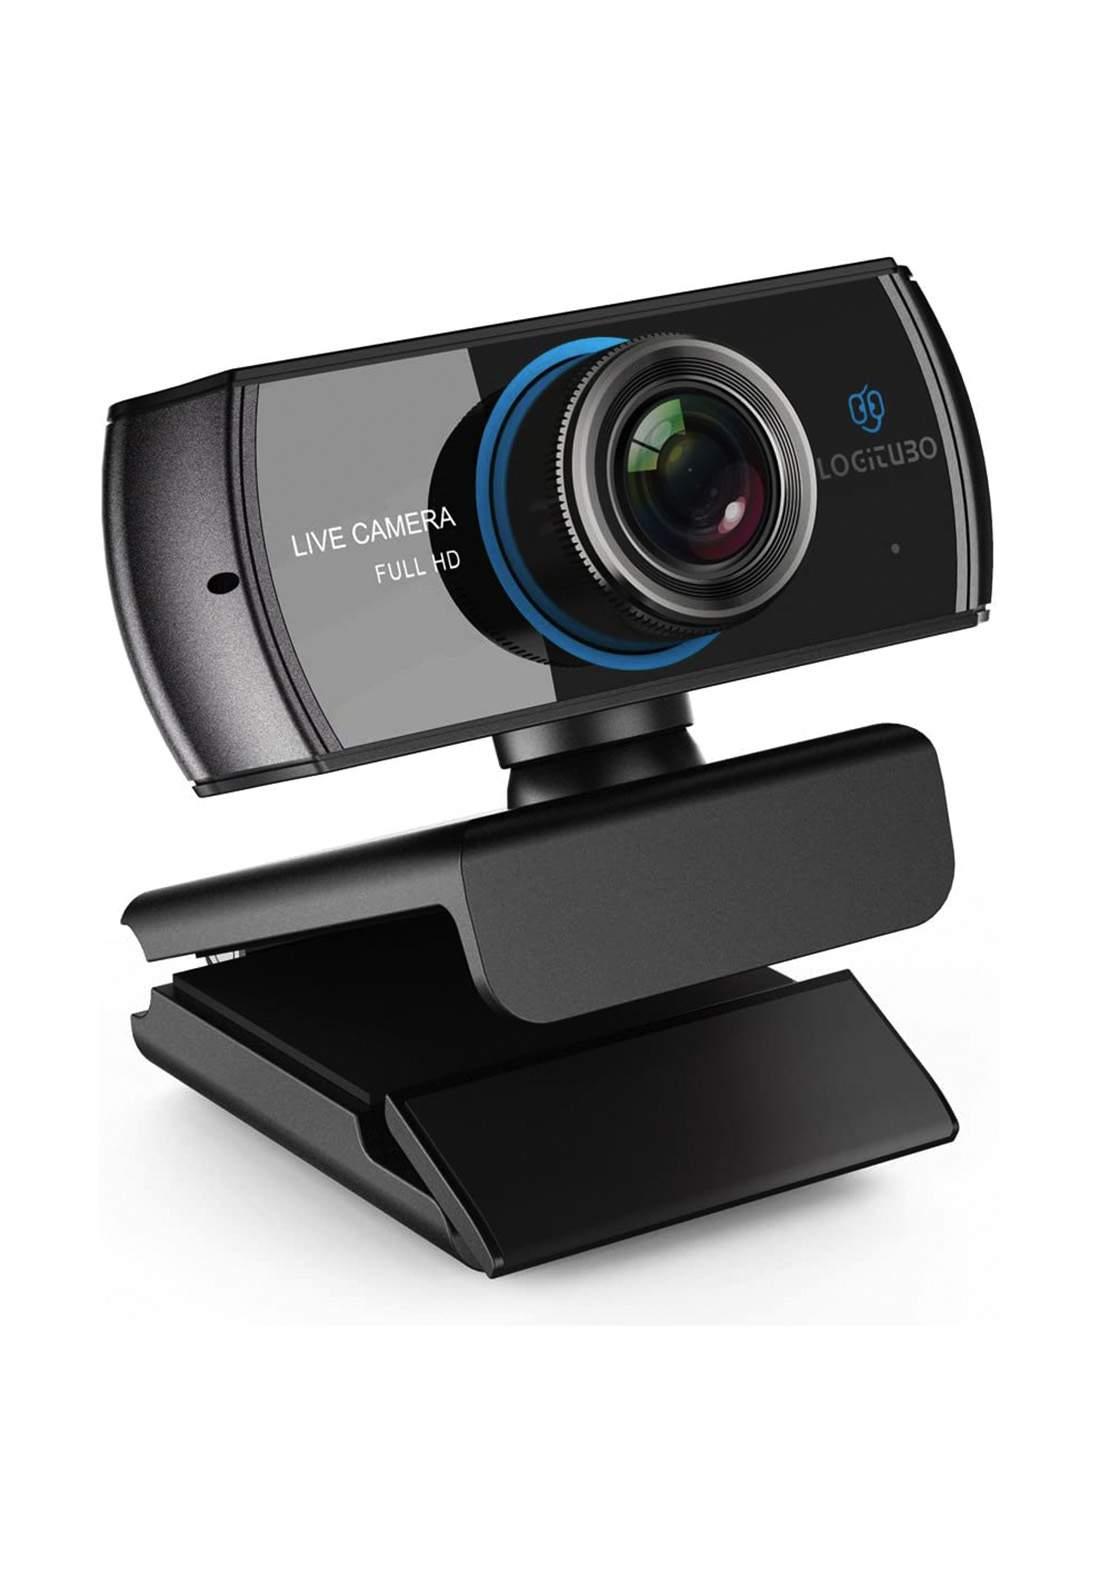 Logitubo 920 PRO  Live Streaming Camera  - Black  كاميرا